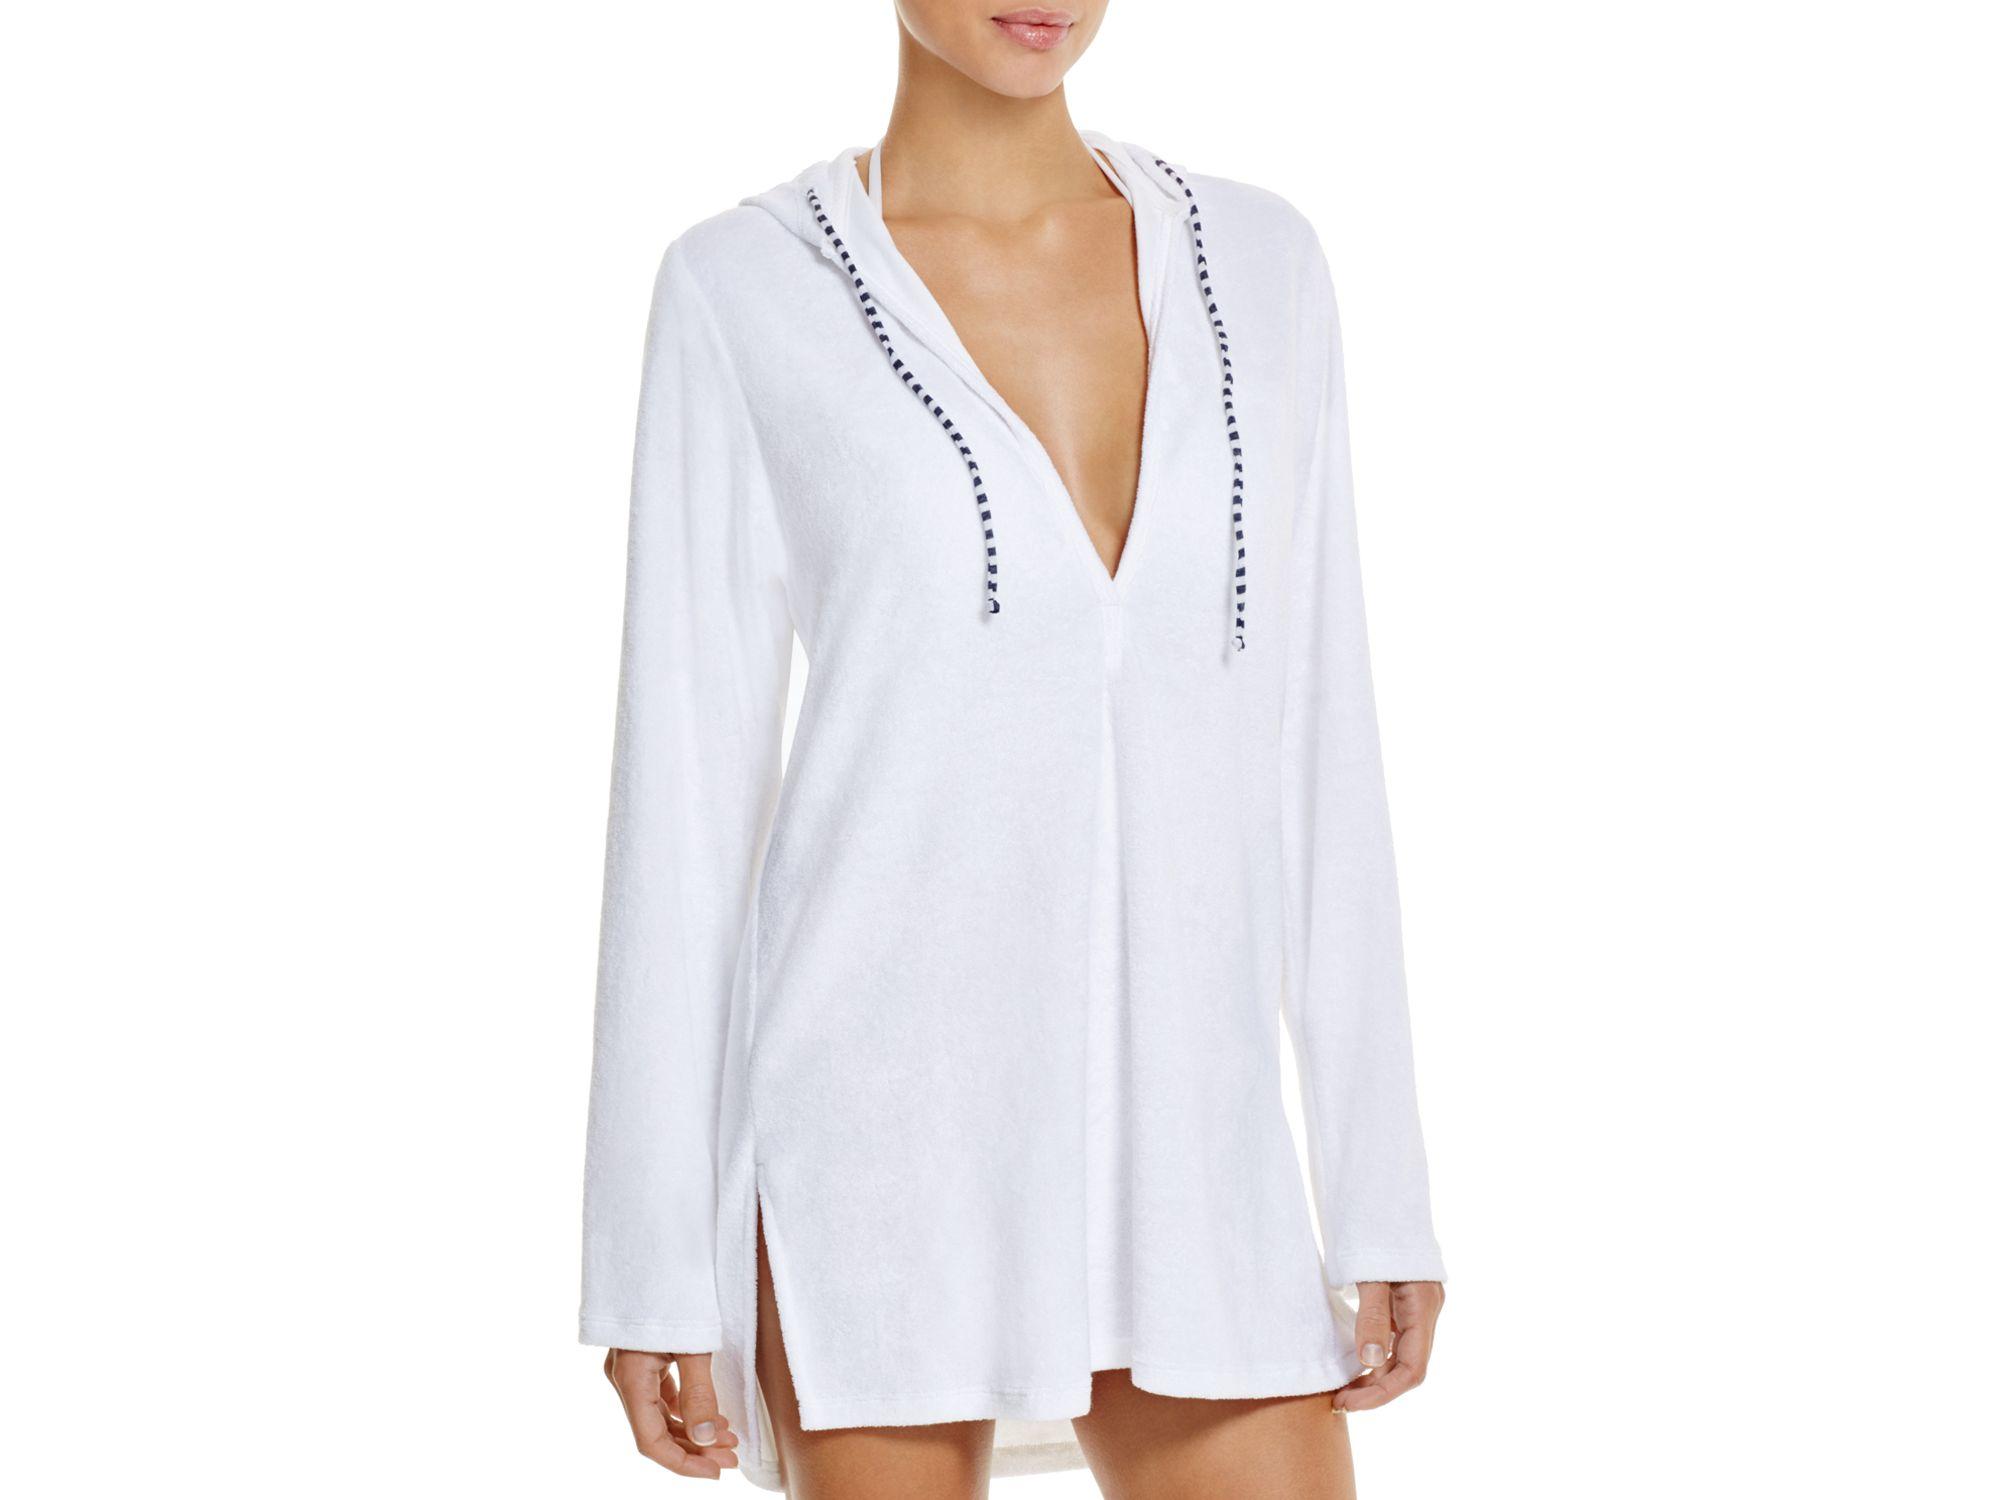 f8091ee5e1534 Splendid Hamptons Terry Tunic Swim Cover Up in White - Lyst